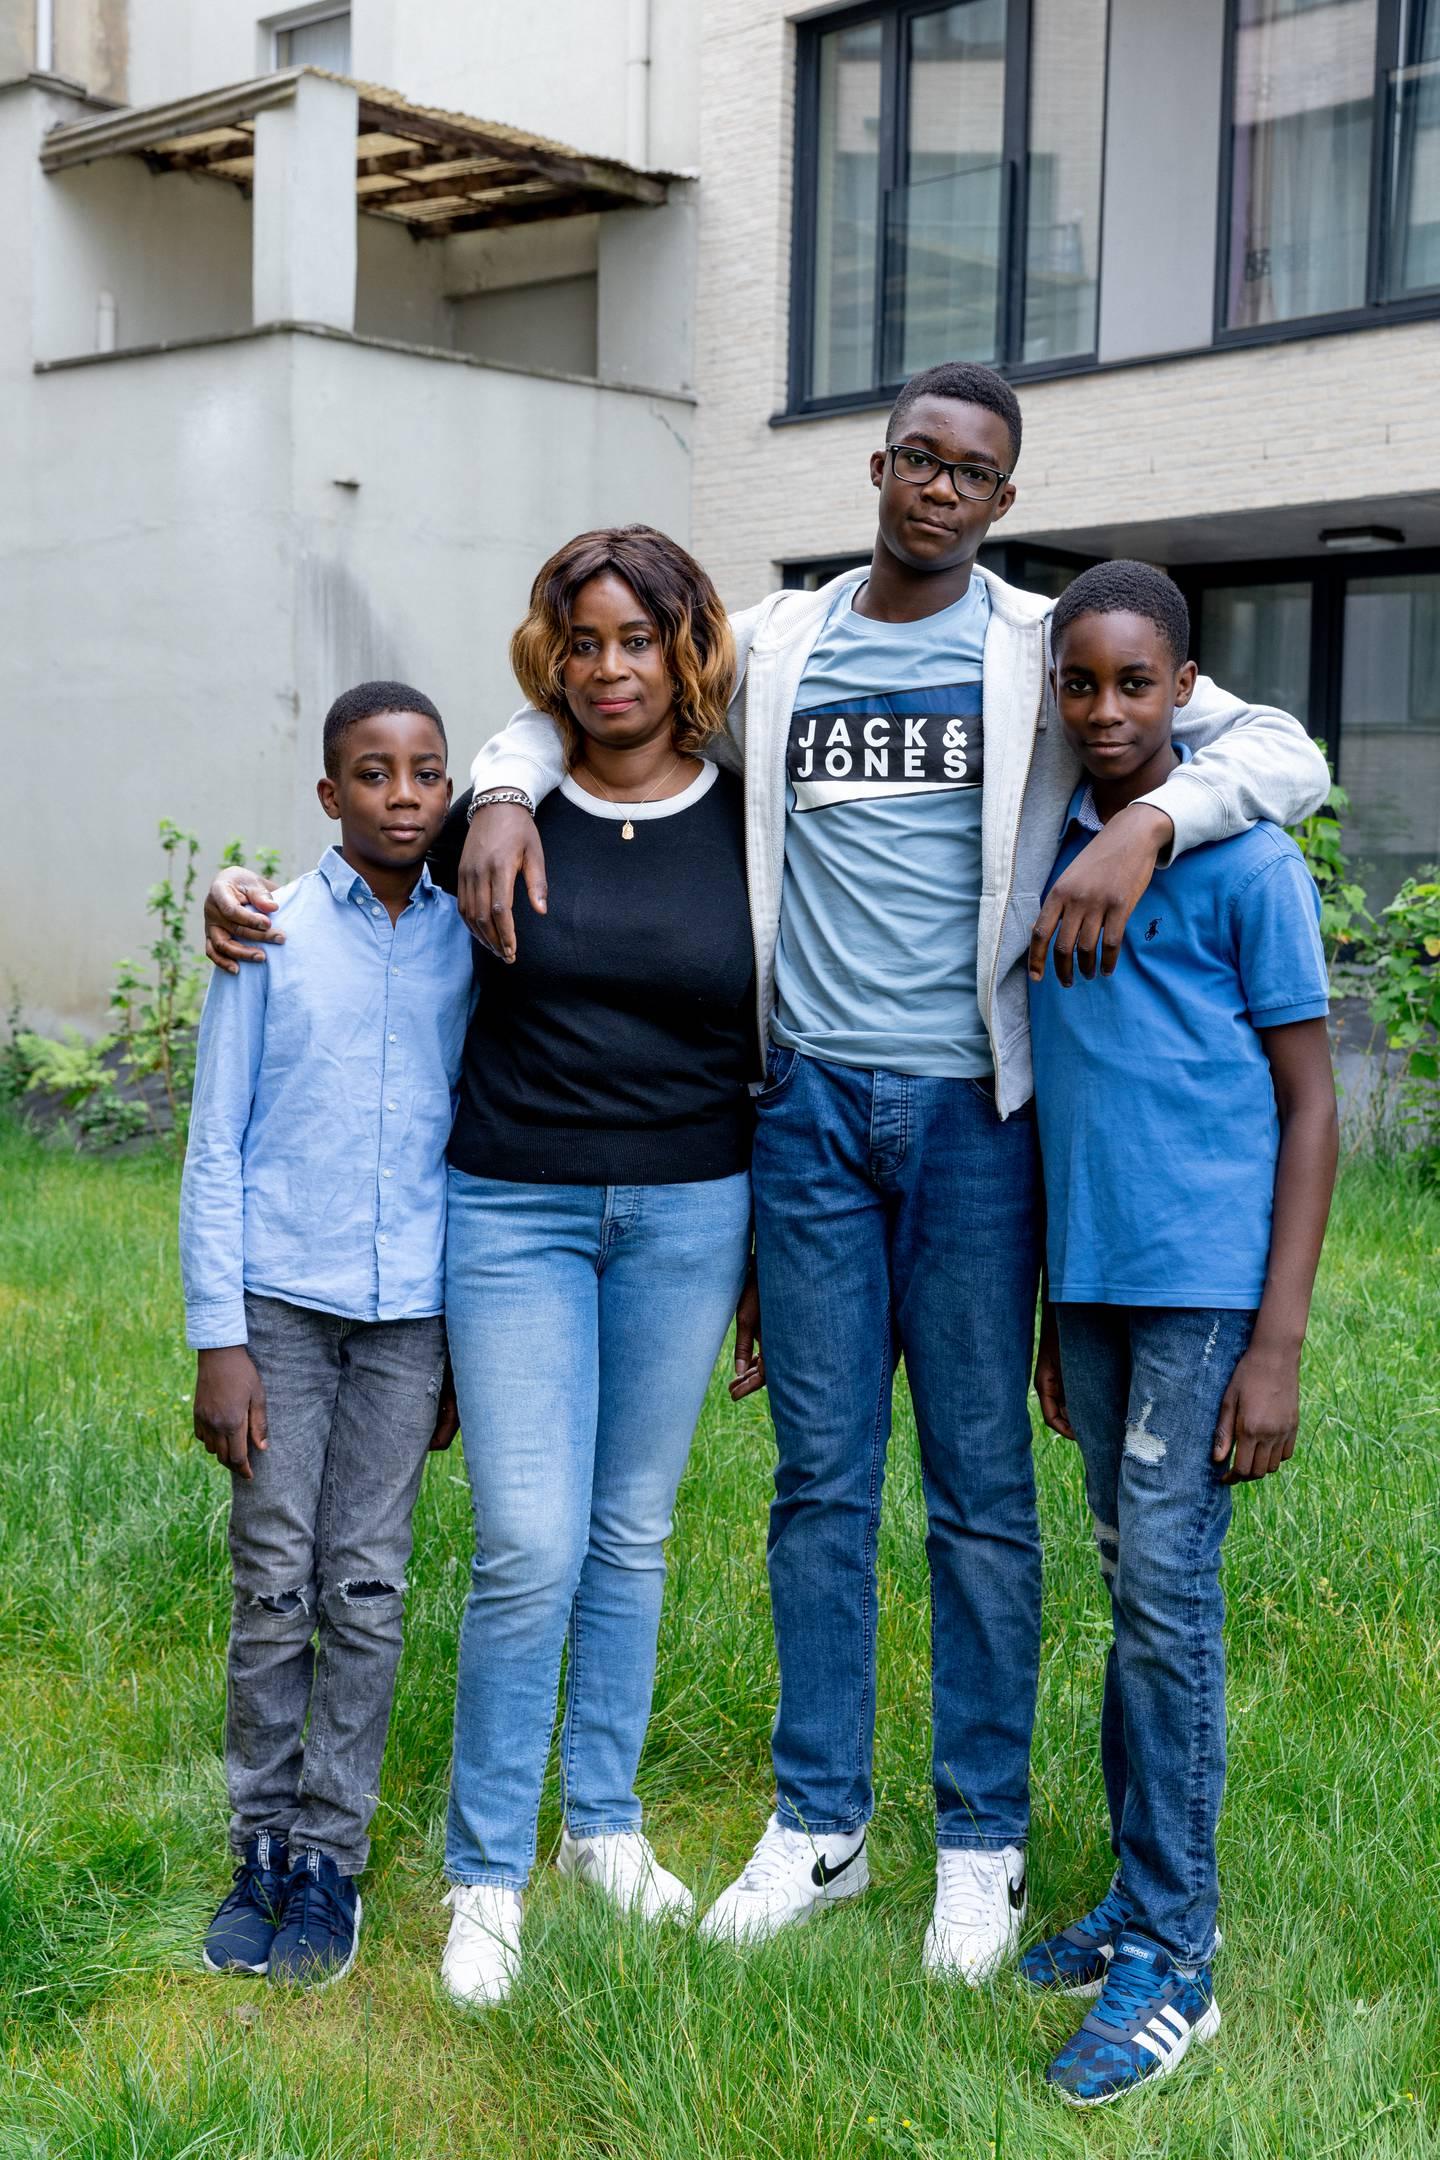 Akakpo Family in front of Arc-en-Ciel homes - photo Ines Van Steenkiste